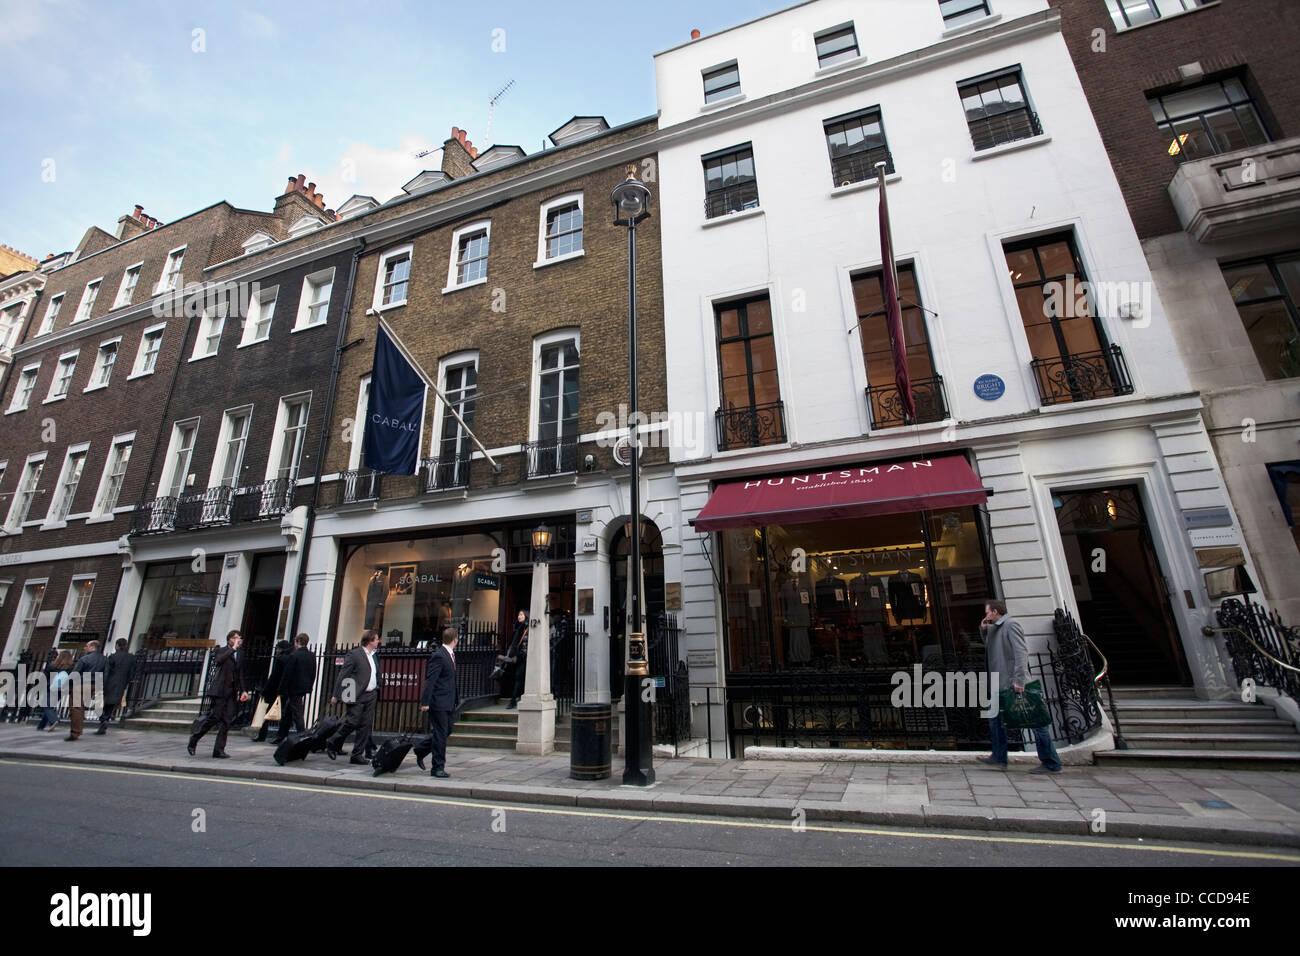 Savile Row, London, United Kingdom. Photo: Jeff Gilbert - Stock Image